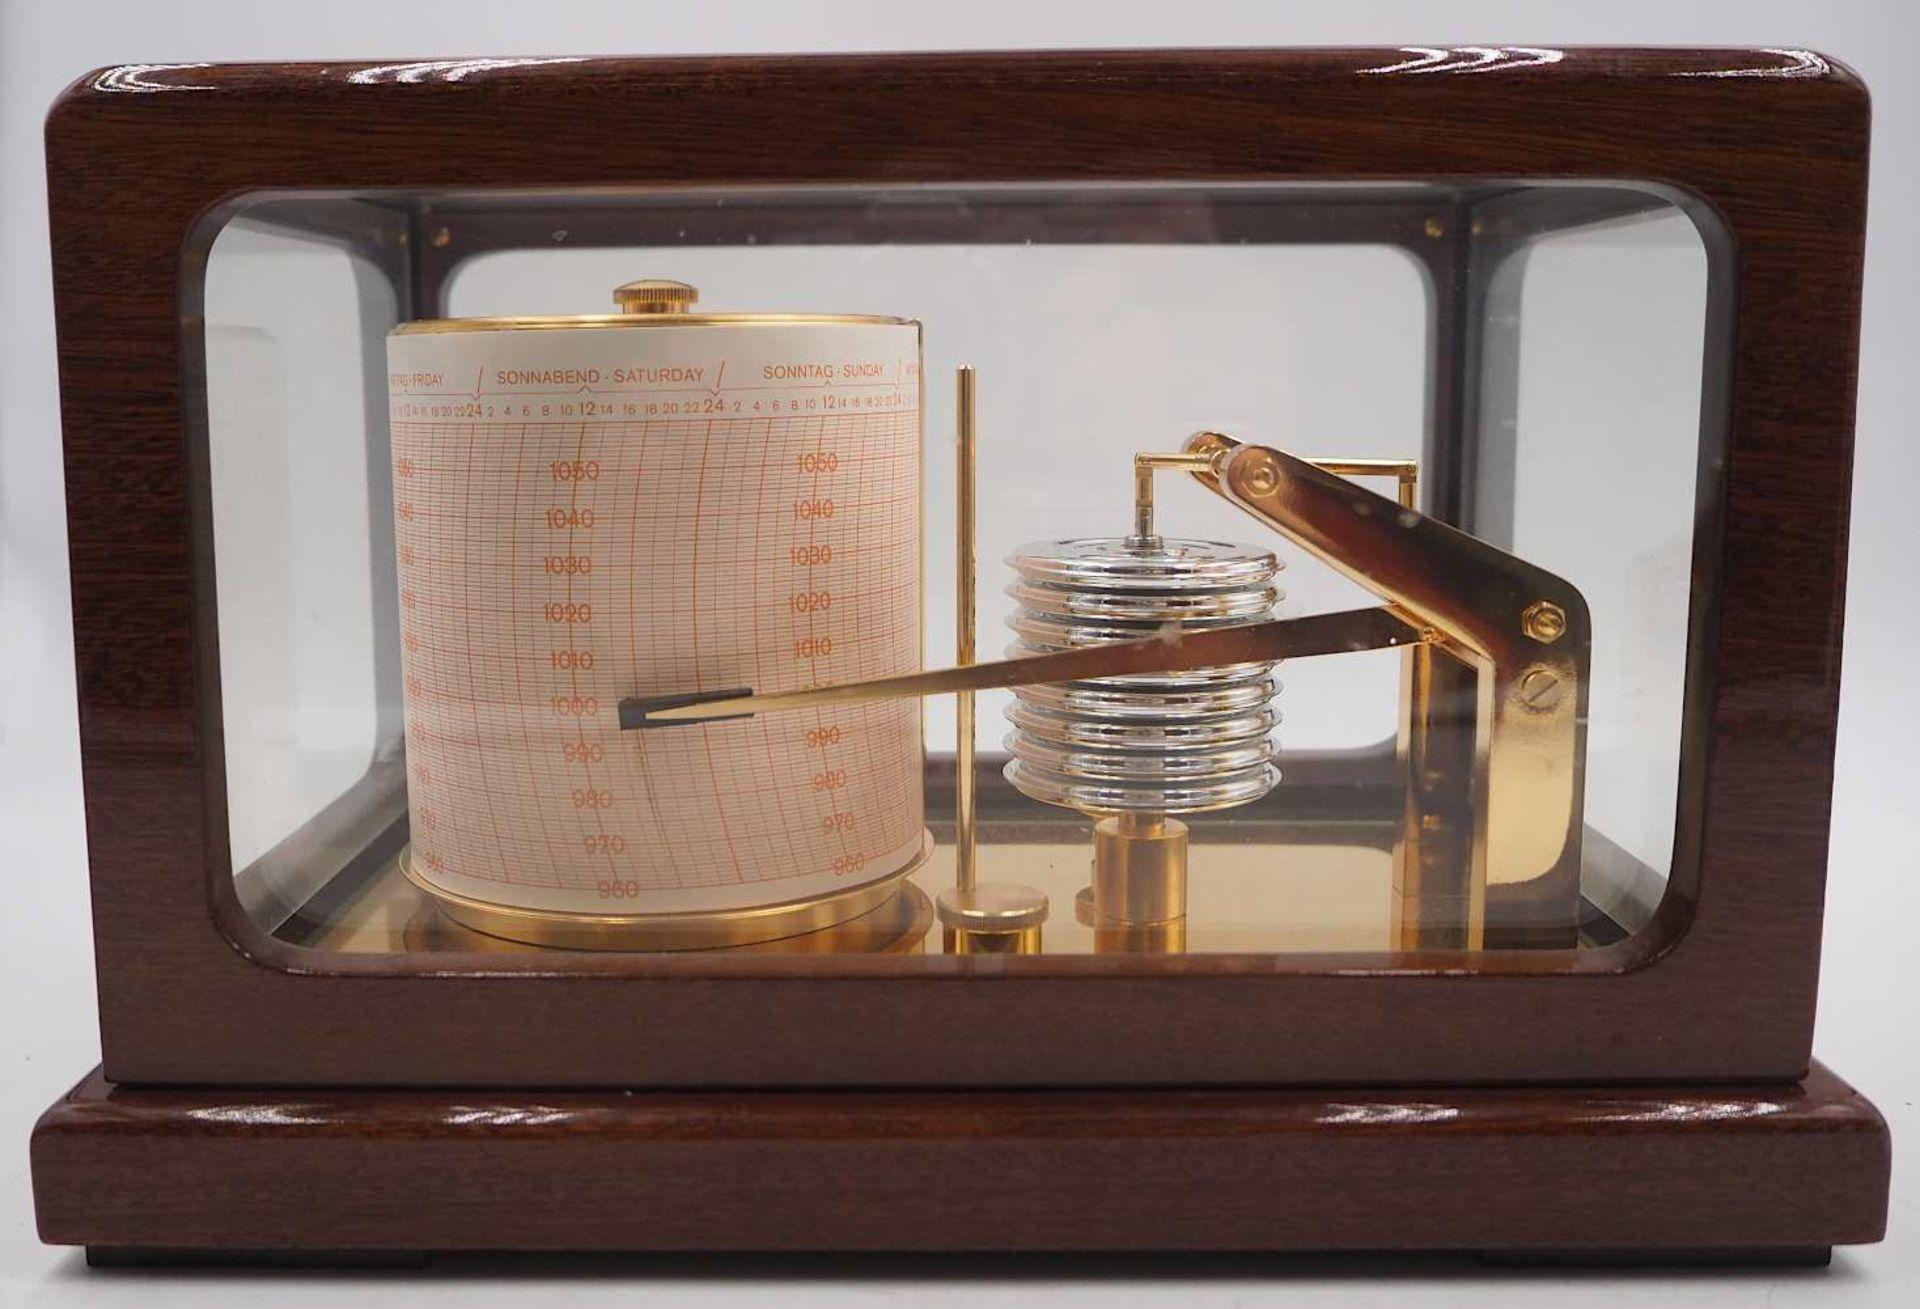 1 Trommelbarograph WEMPE CHRONOMETERWERKE GmbH, 20. Jh. wohl Mahagoni-Gehäuse allseit - Bild 4 aus 6